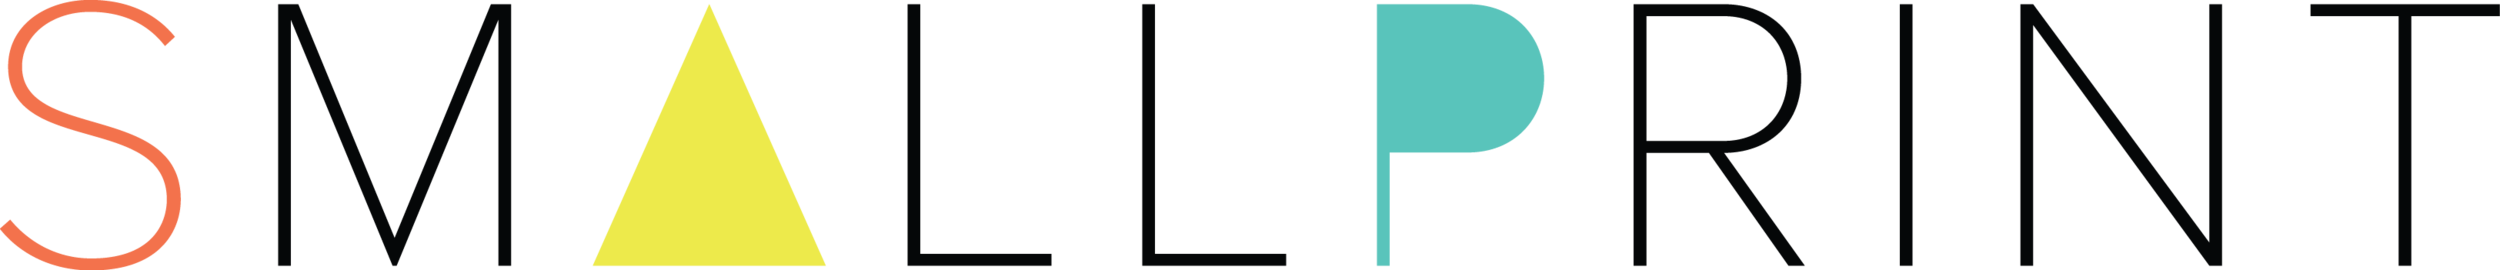 logo_2nd Dec.png